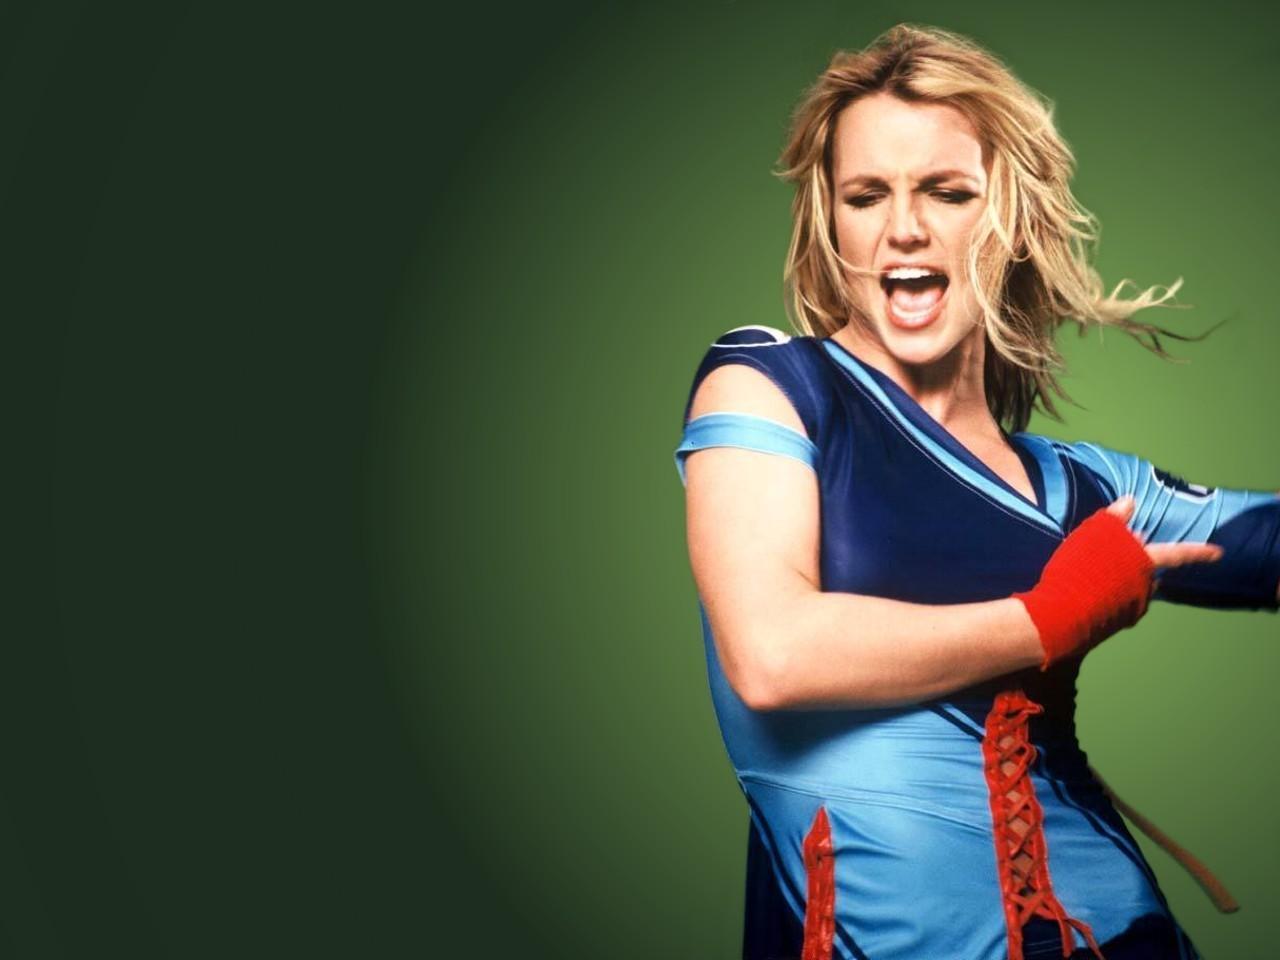 http://1.bp.blogspot.com/-3Me1as5mj3I/TzFpqDehn_I/AAAAAAAARQ4/LbVFmBh7LYw/s1600/Britney-Pepsi-Wallpaper-britney-spears-10342504-1280-960.jpg